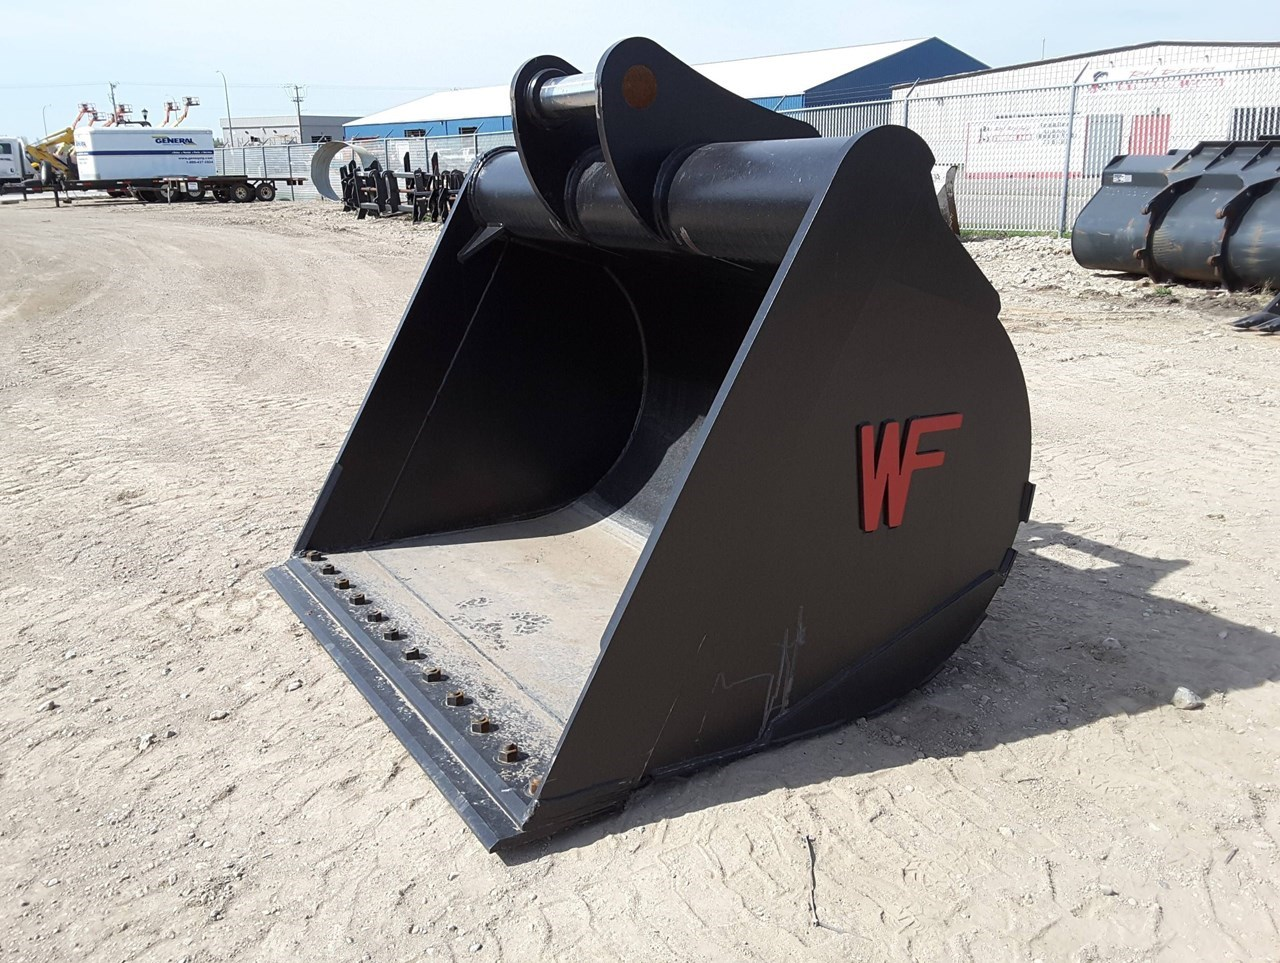 2019 WAHPETON FABRICATION PC490D72 Excavator Bucket For Sale